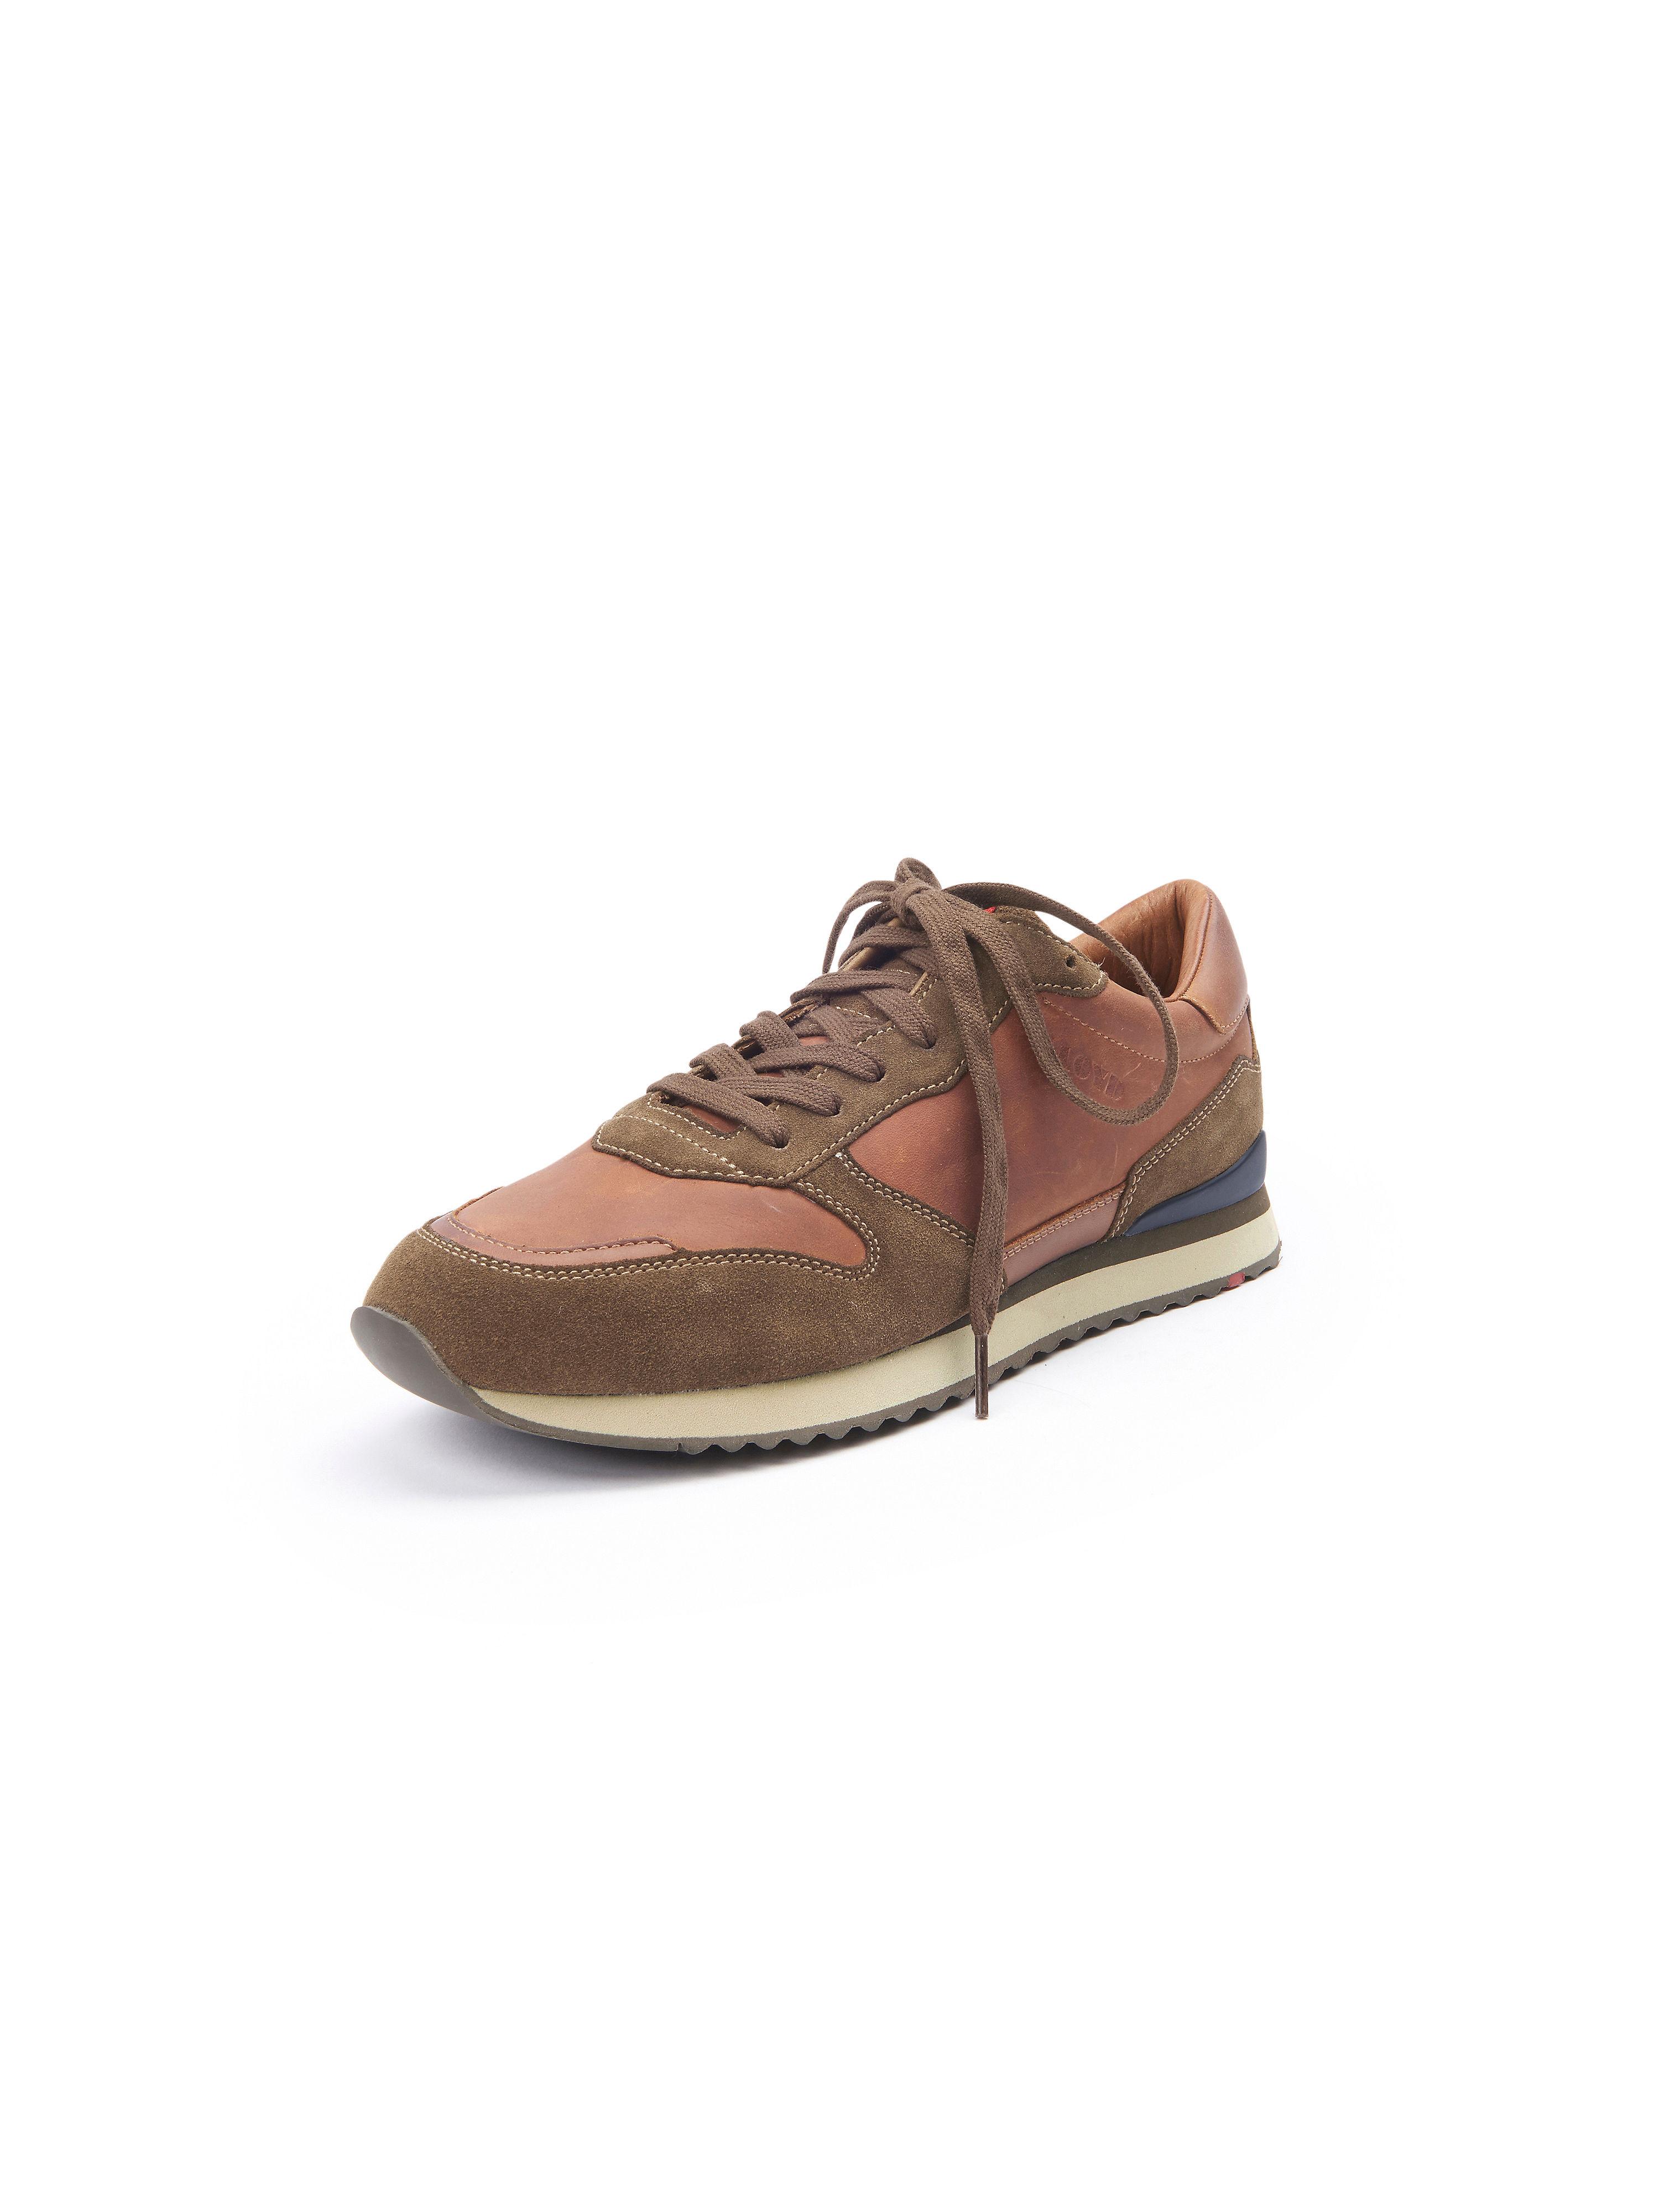 Sneakers Edwin Van Lloyd bruin